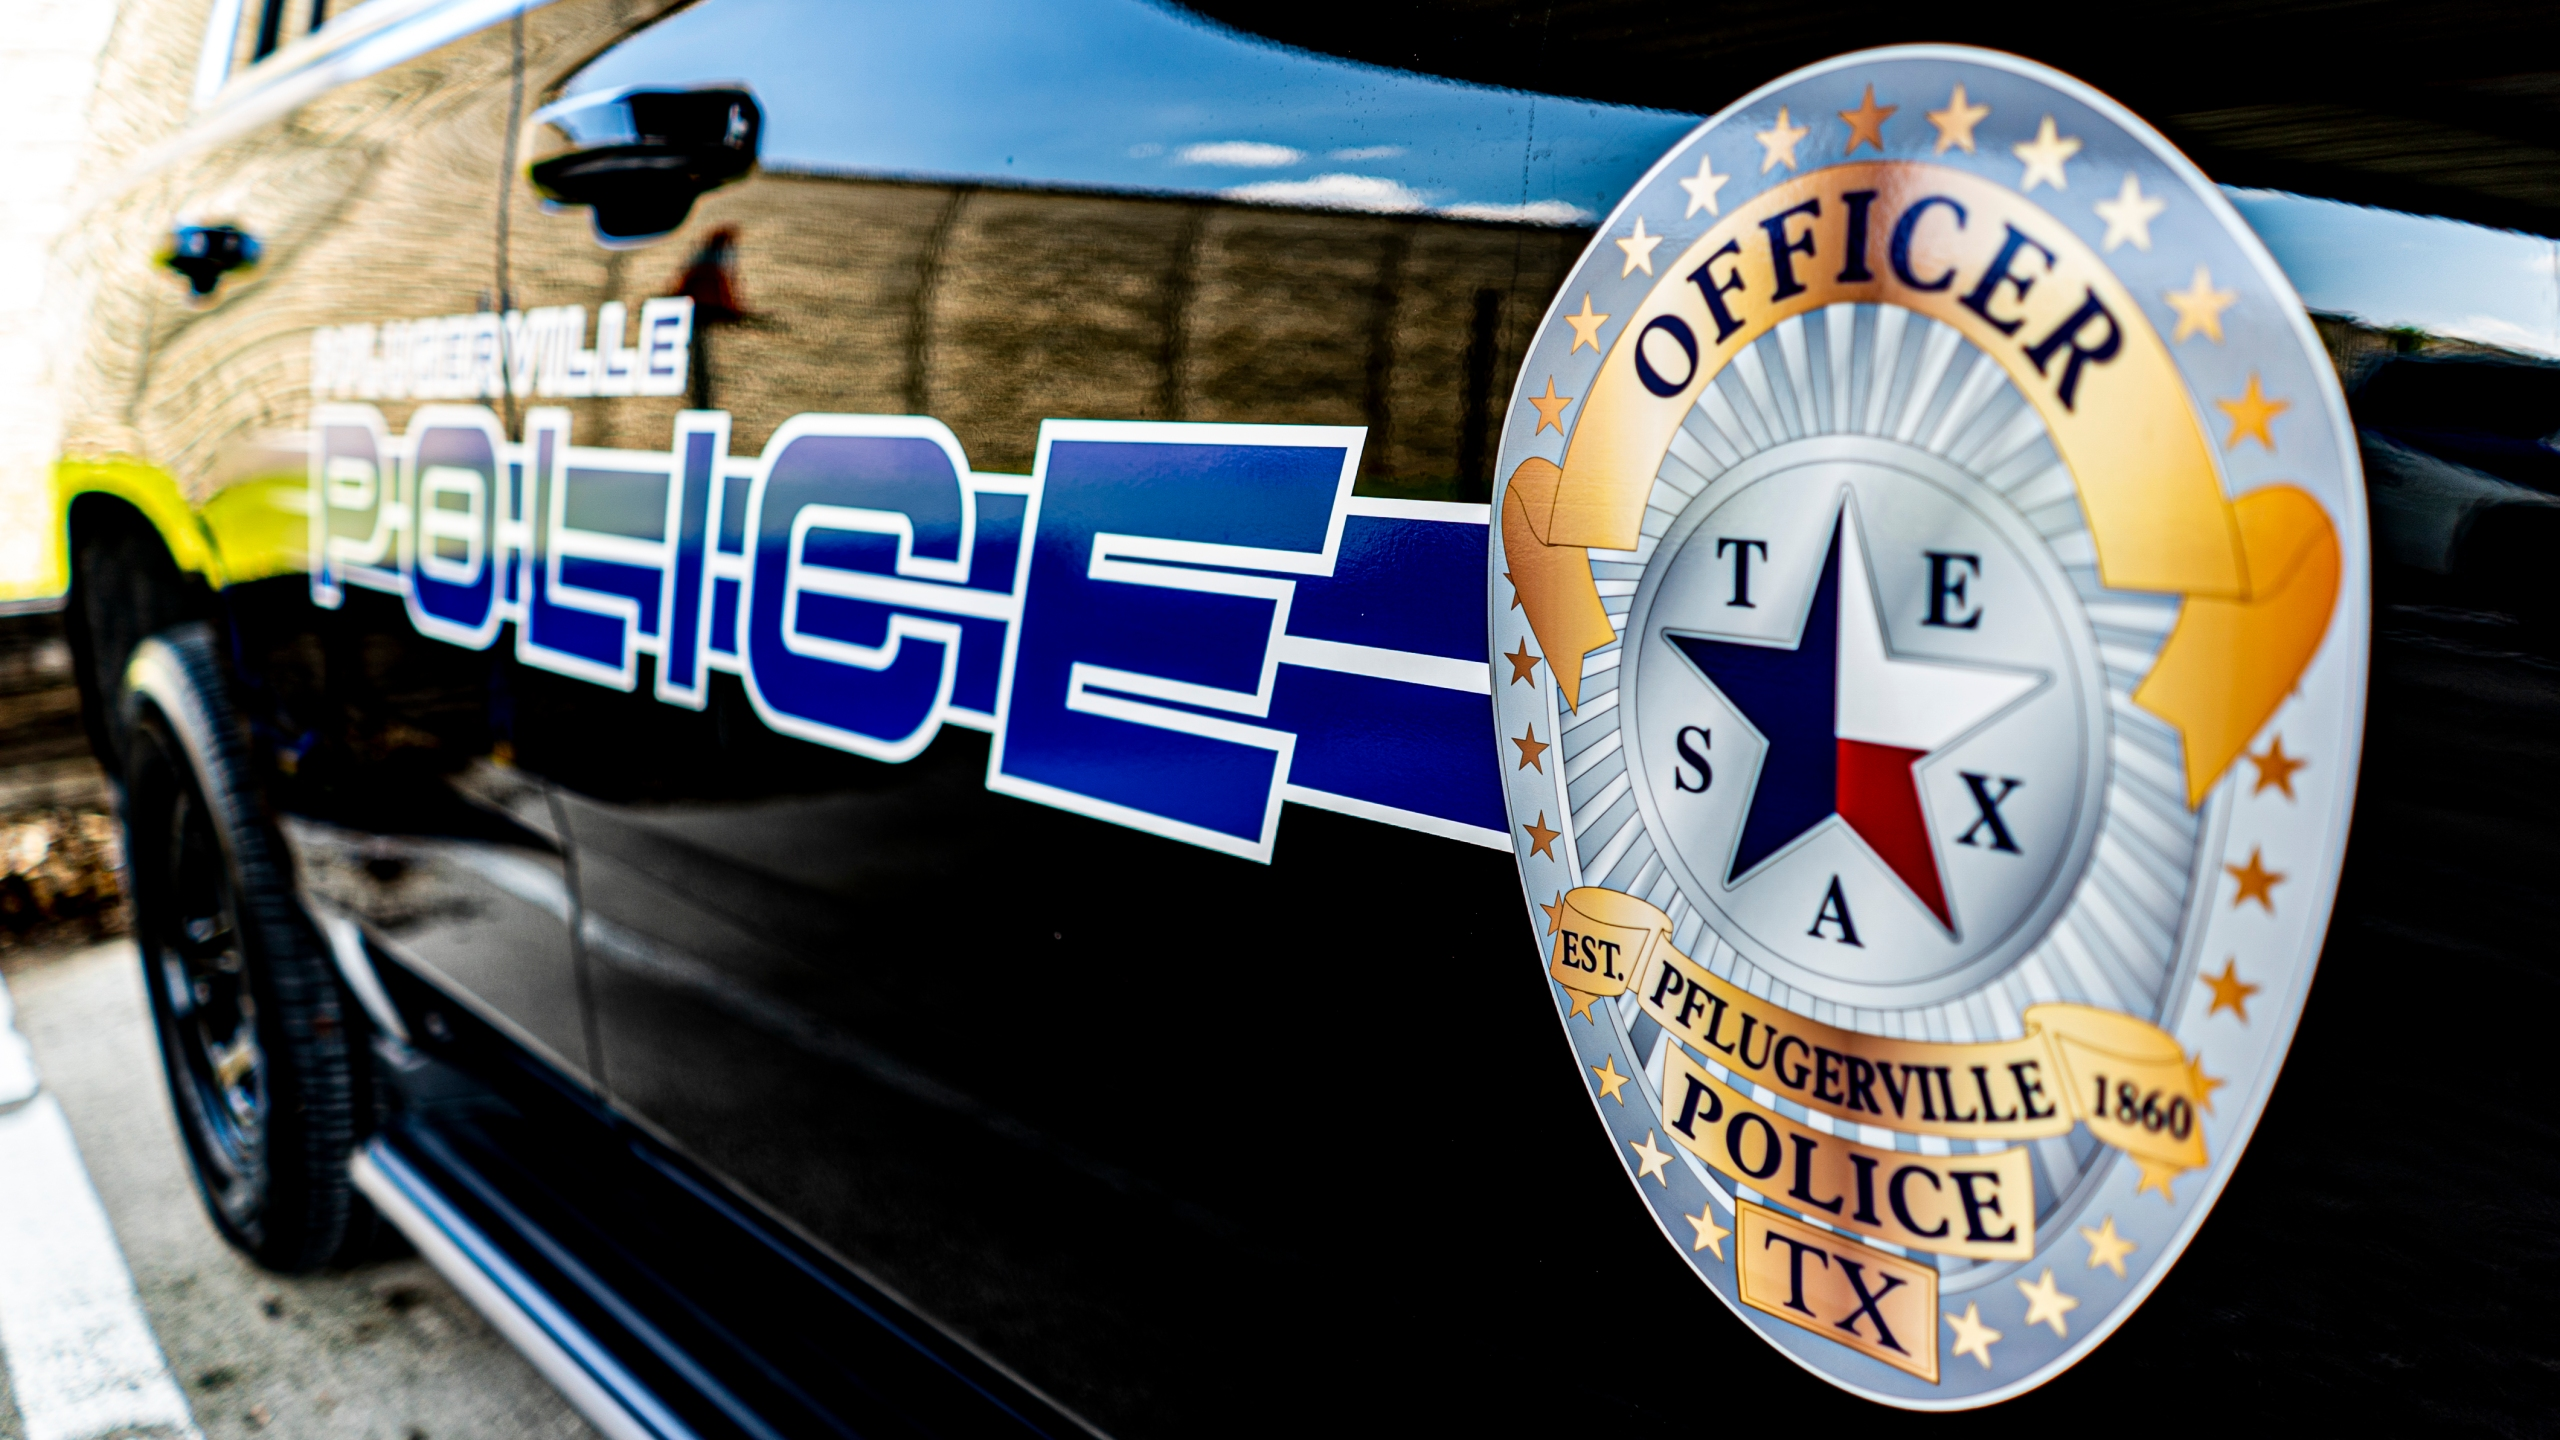 Pflugerville police vehicle (Pflugerville Police Department Photo)